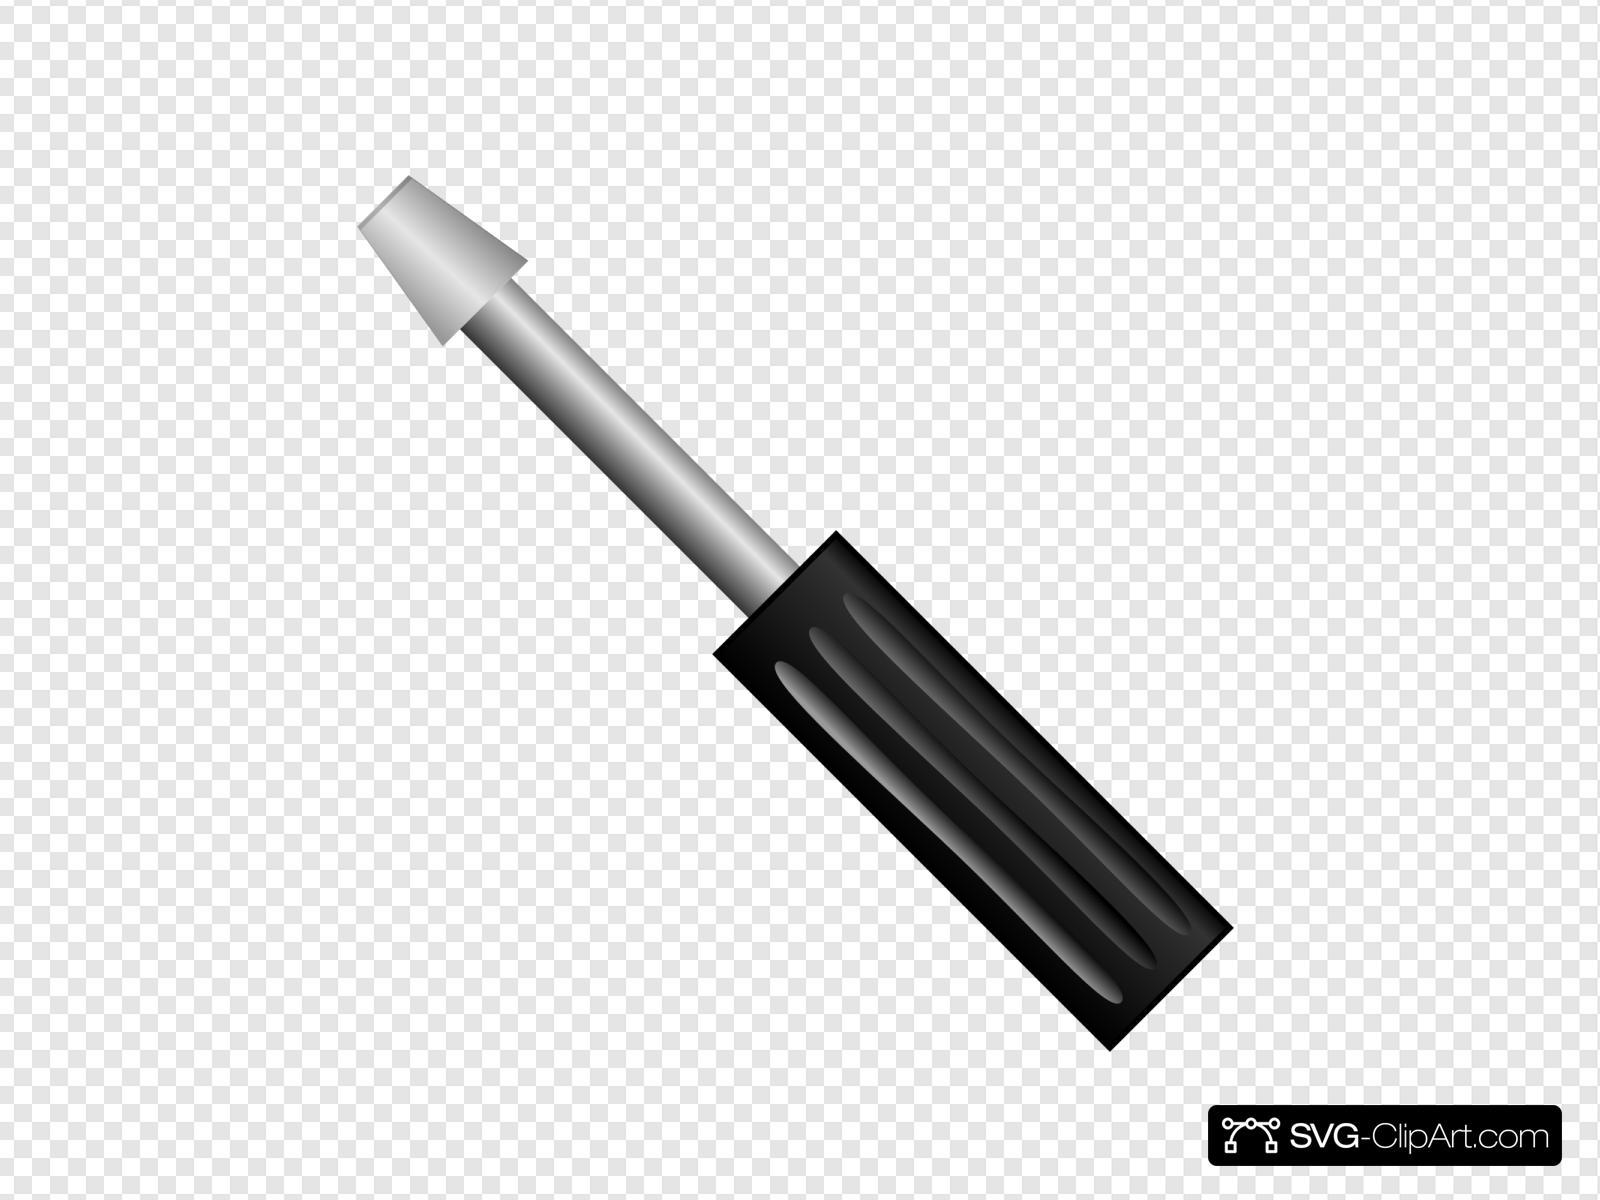 Clip art icon and. Screwdriver clipart svg